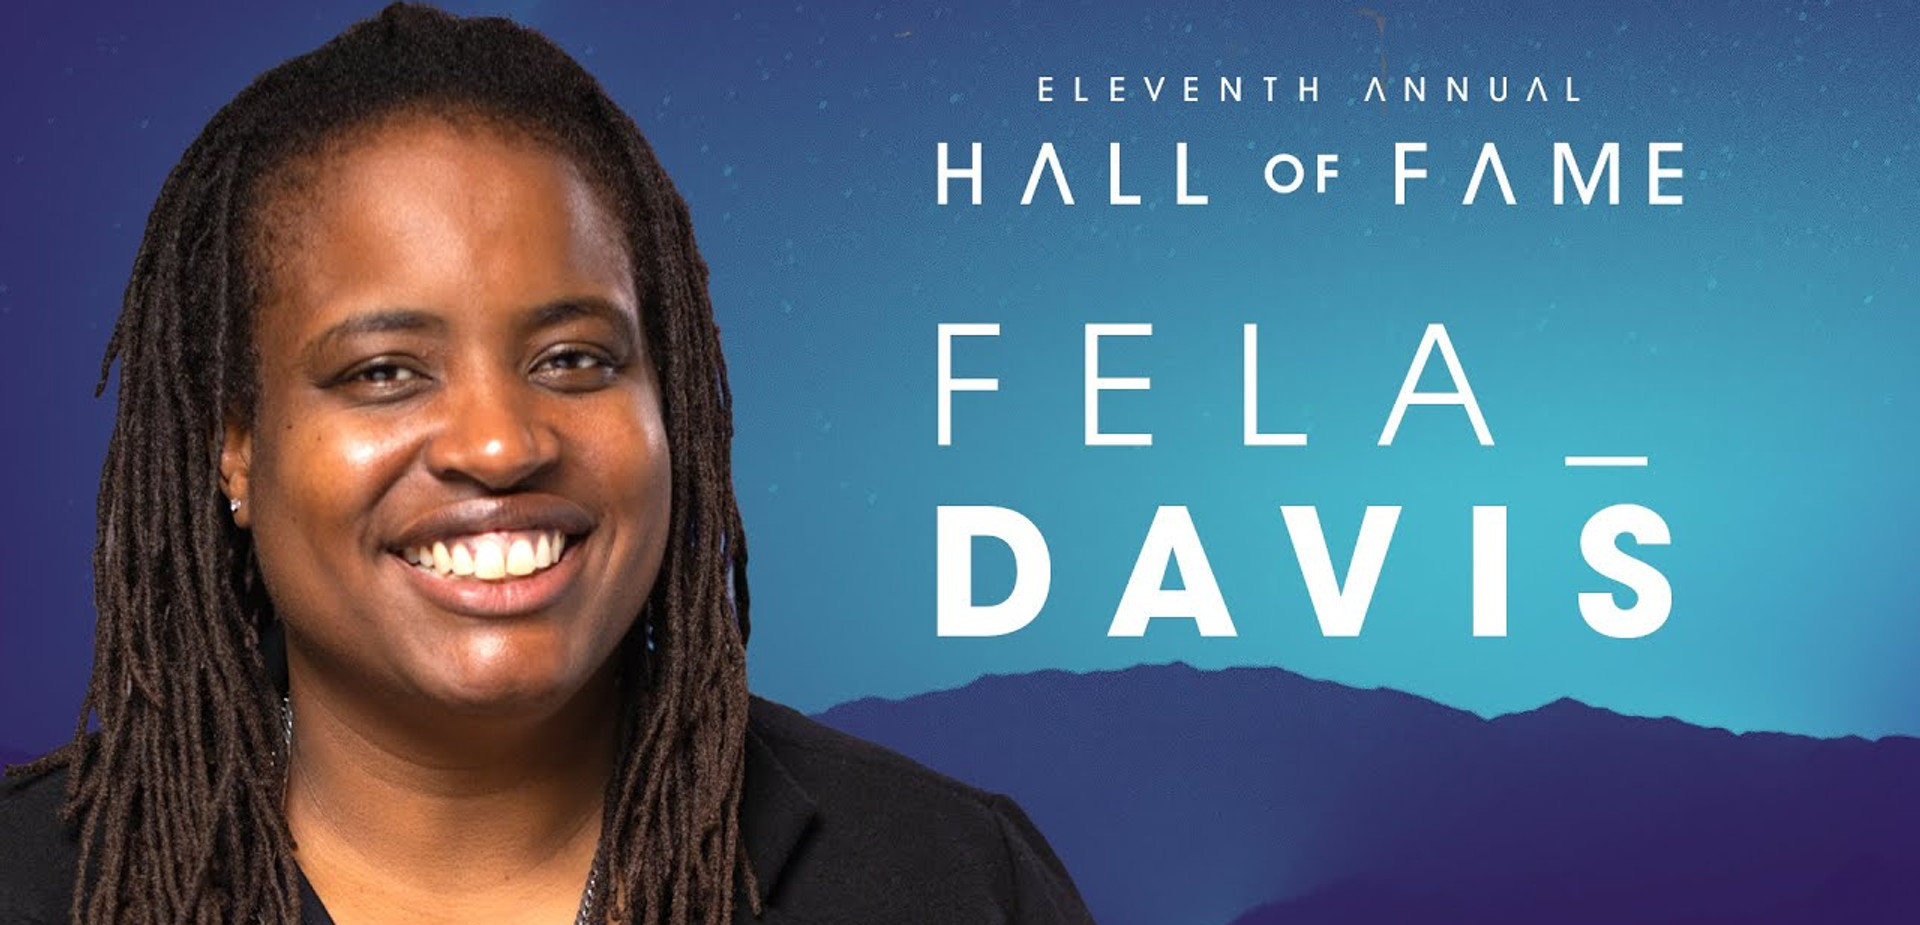 Fela Davis (House of Blues, Christian McBride) | Full Sail University